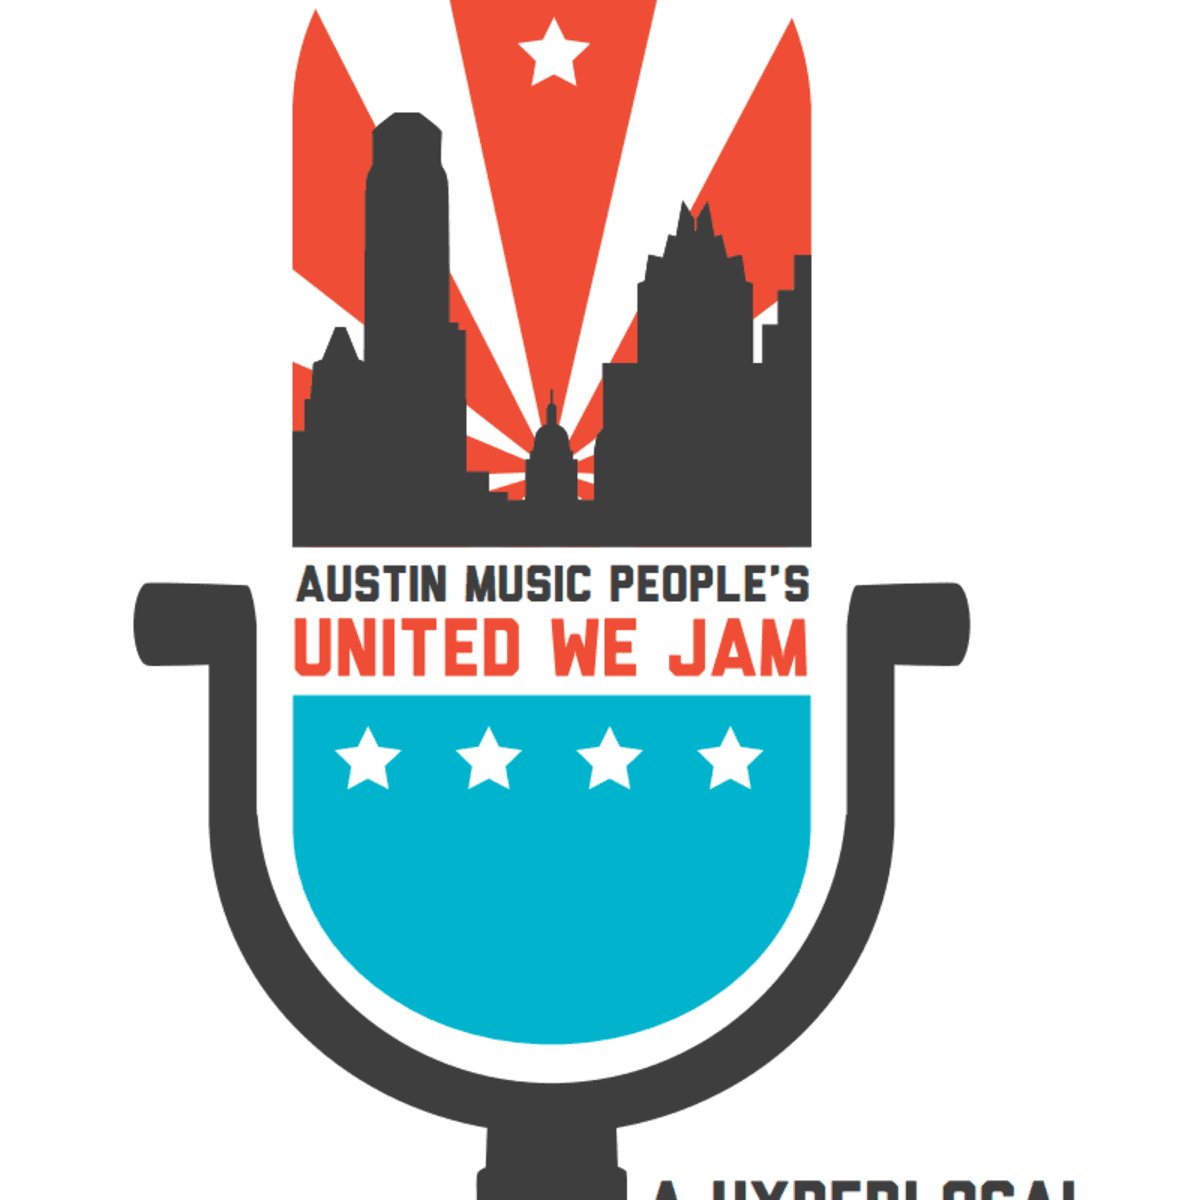 Austin Music People AMP United We Jam poster 2013